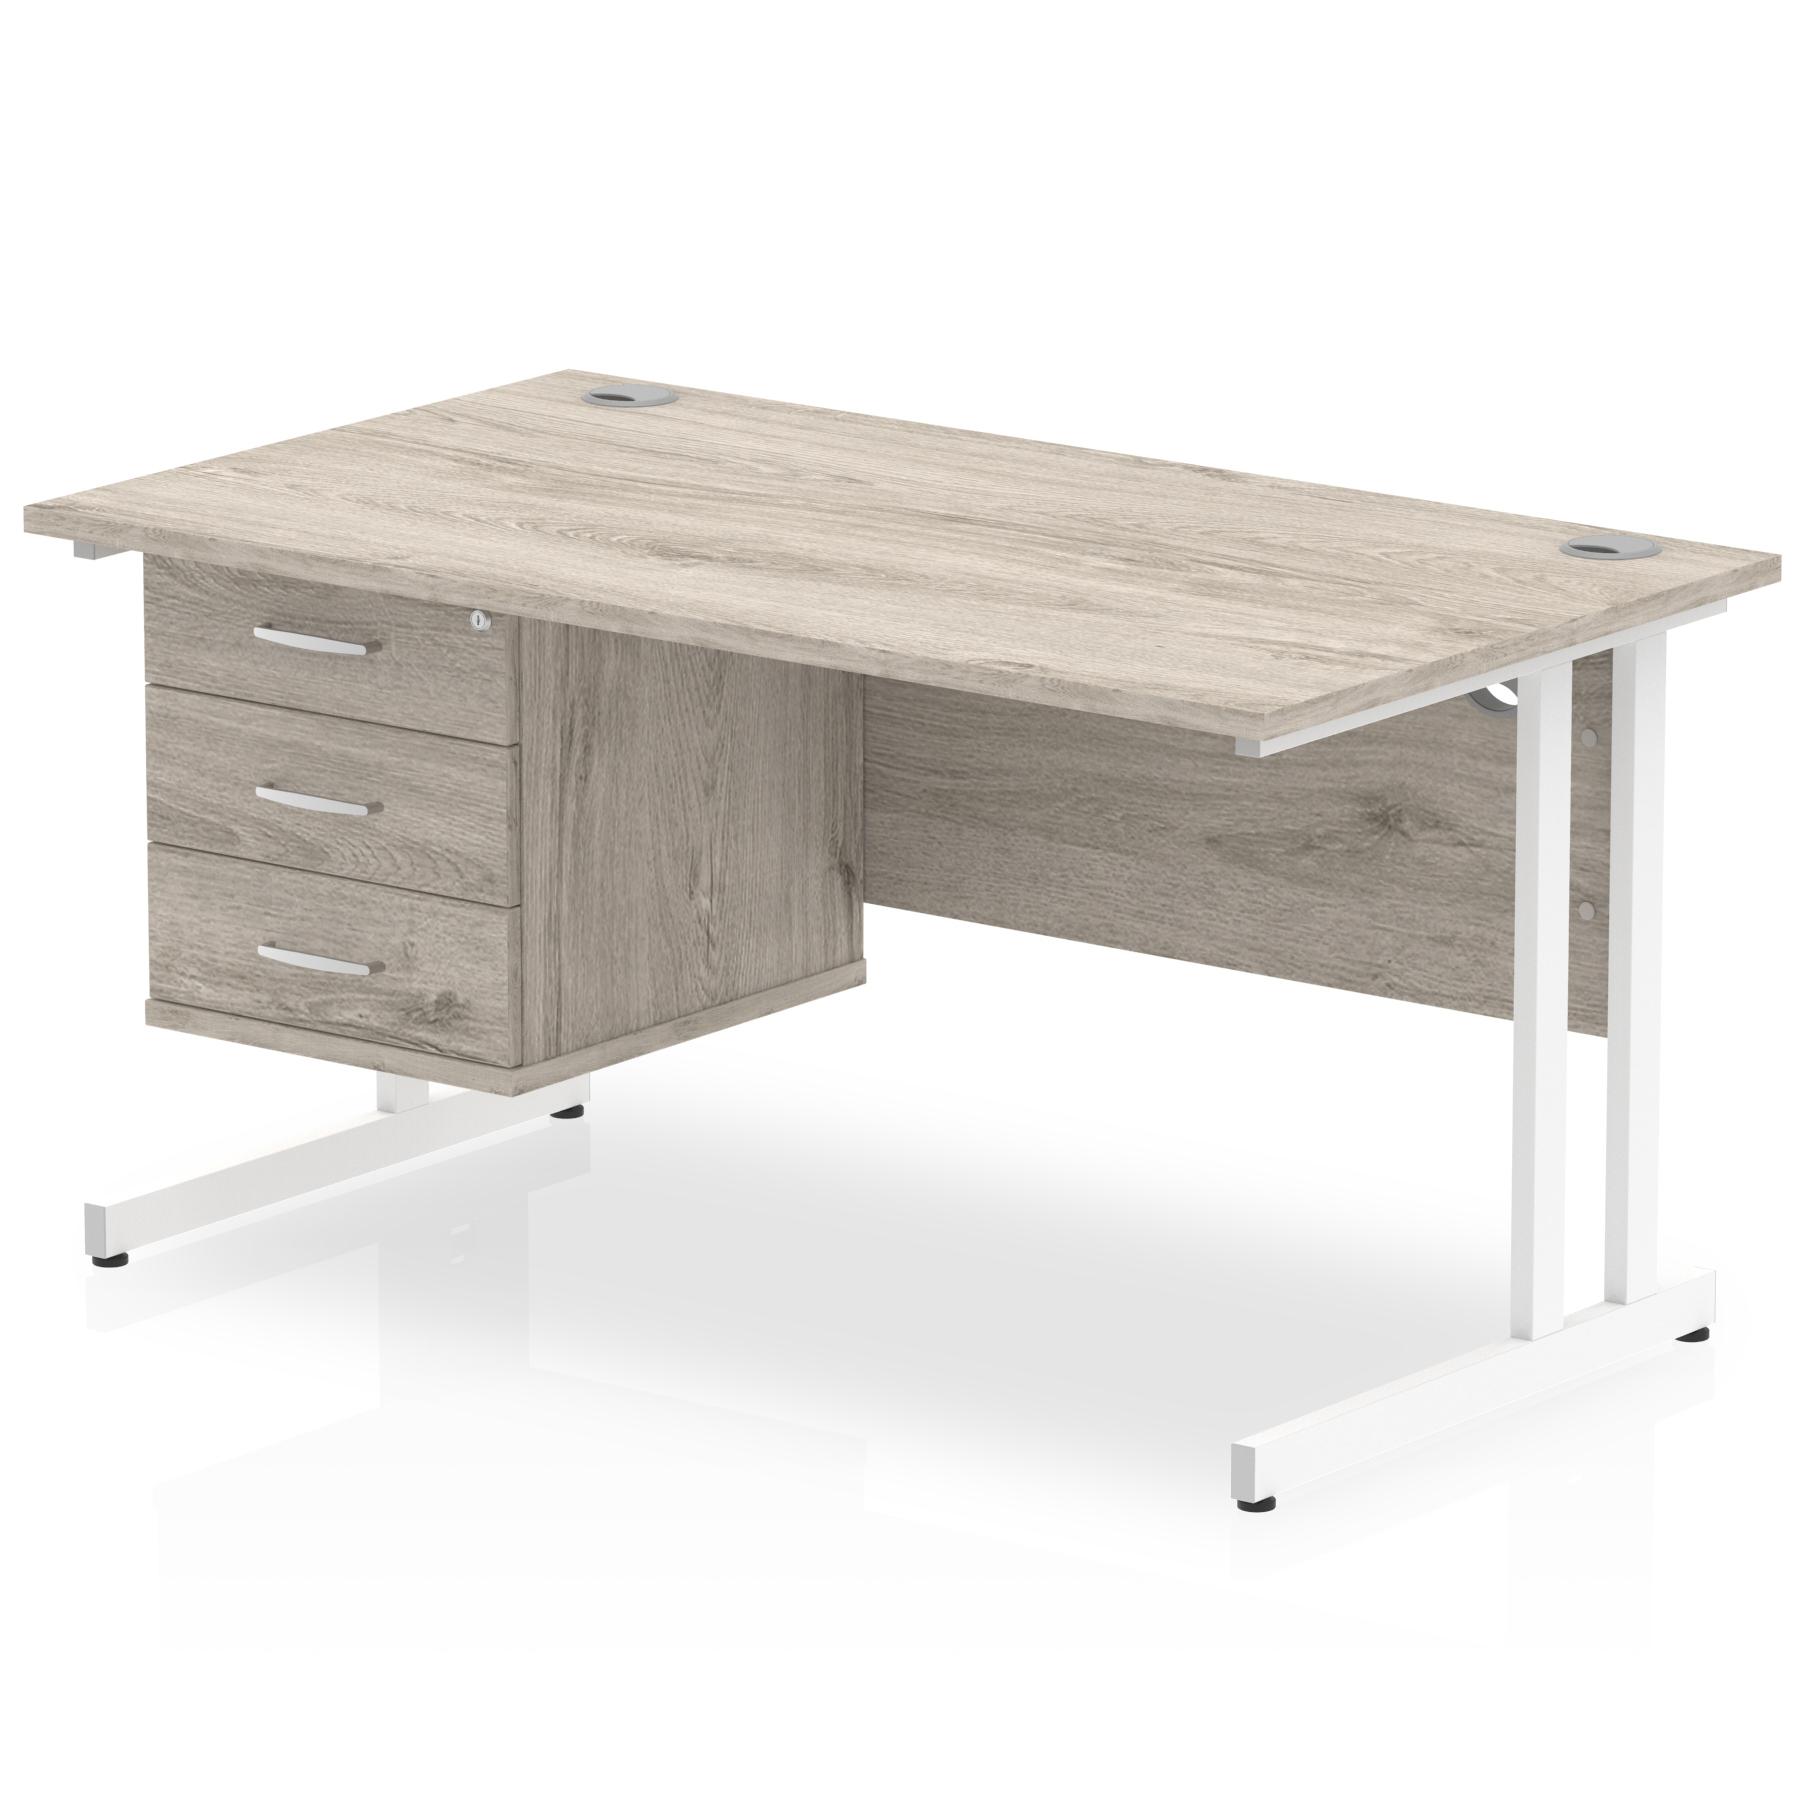 Trexus Rectangular Desk White Cantilever Leg 1400x800mm Fixed Ped 3 Drawers Grey Oak Ref I003472